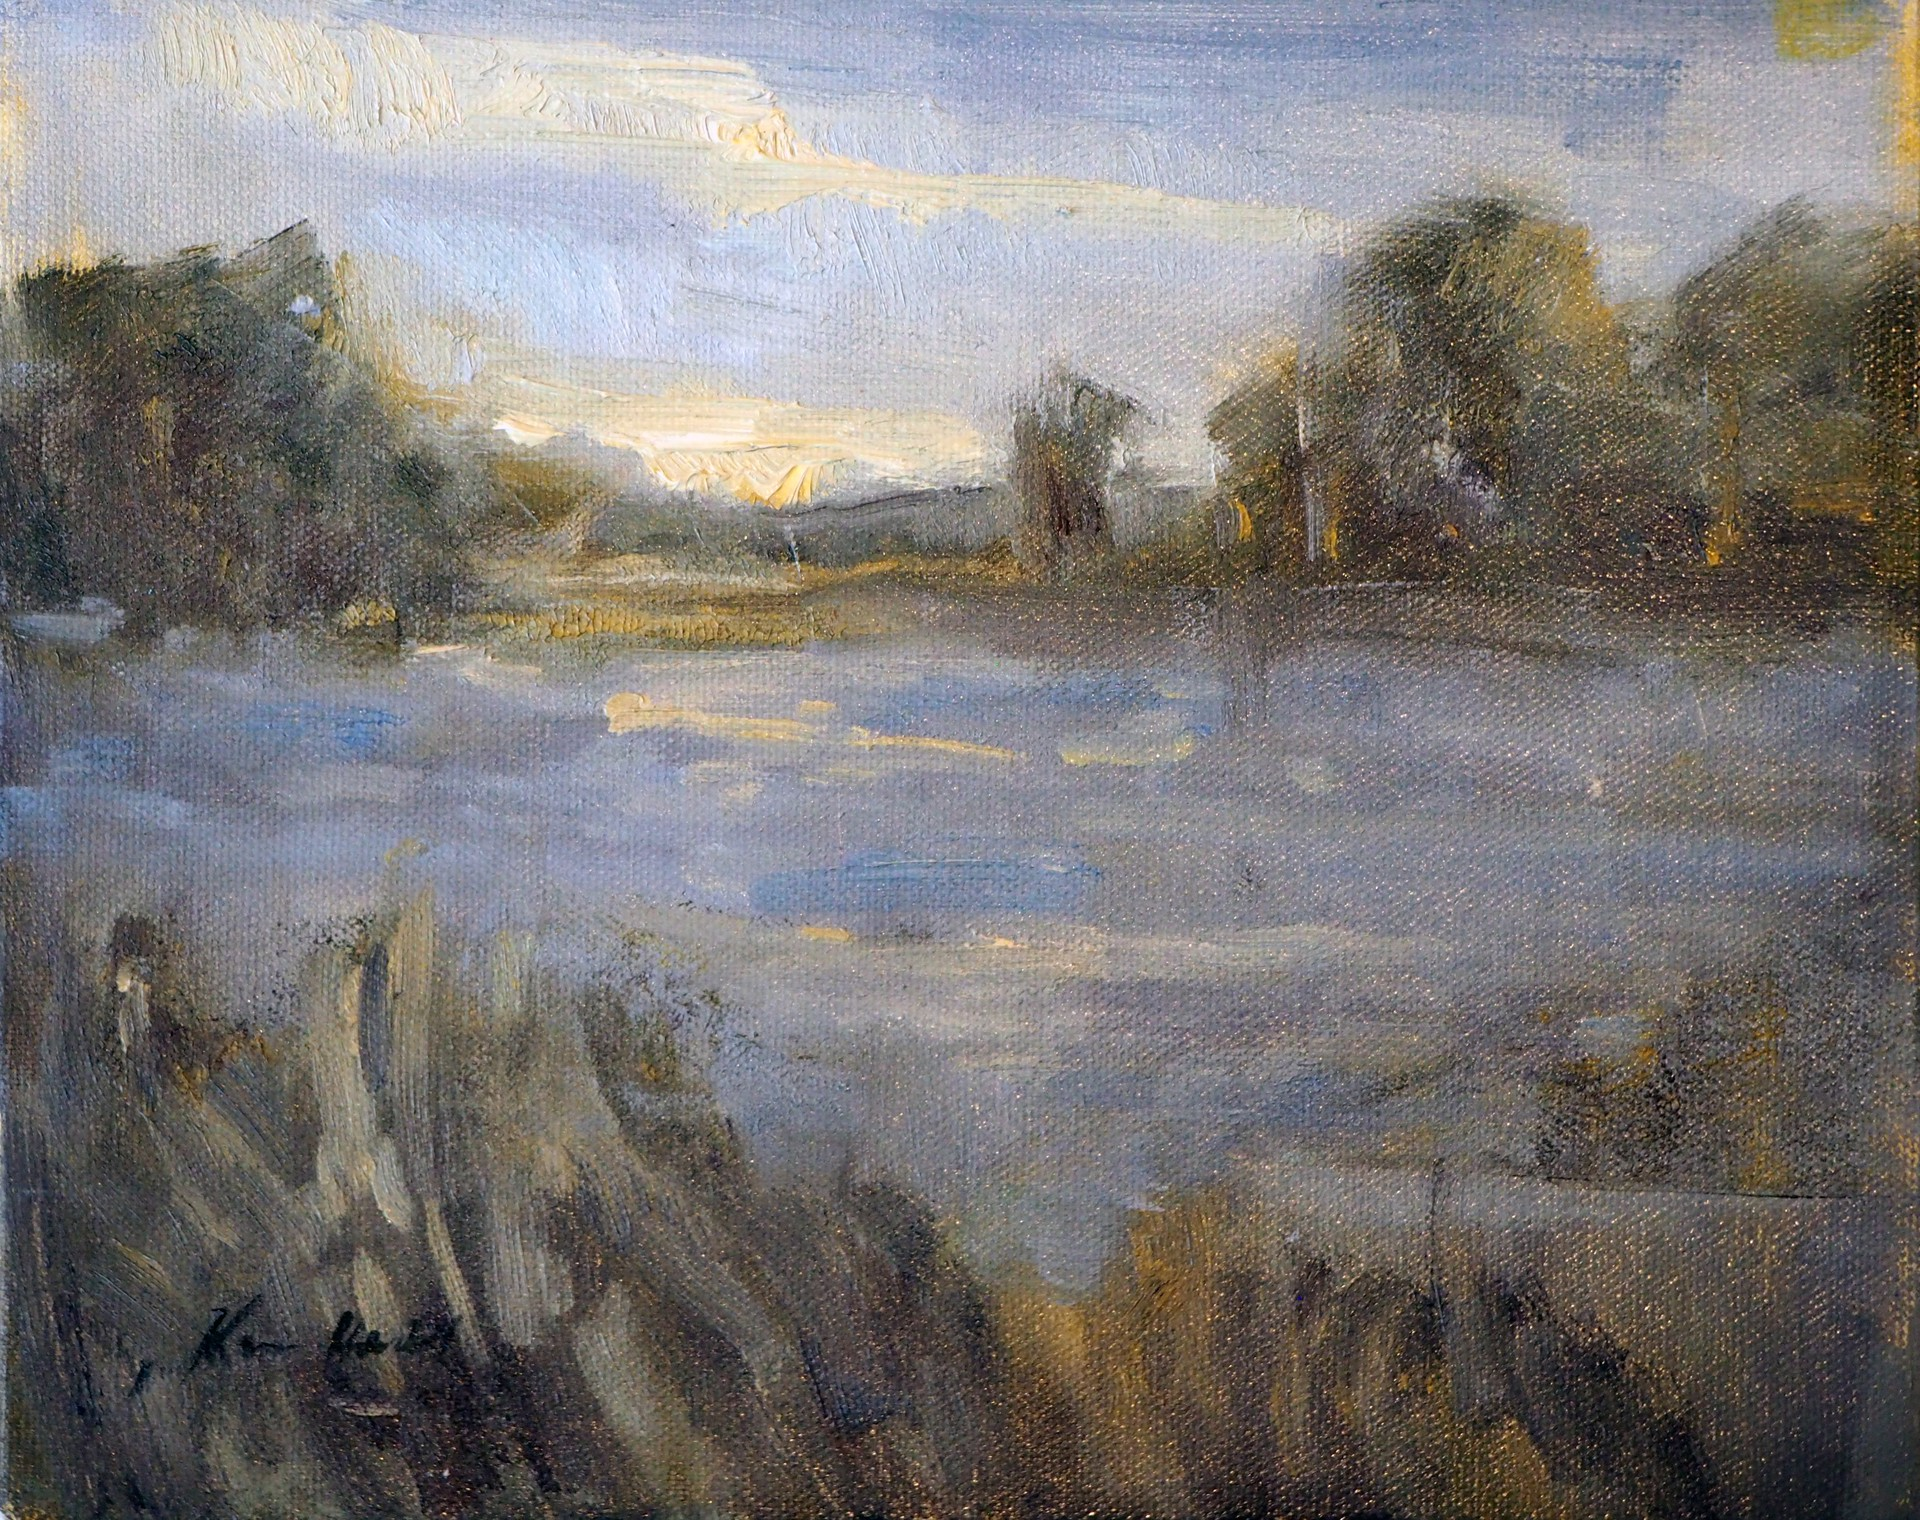 Misty Day on the River by Karen Hewitt Hagan